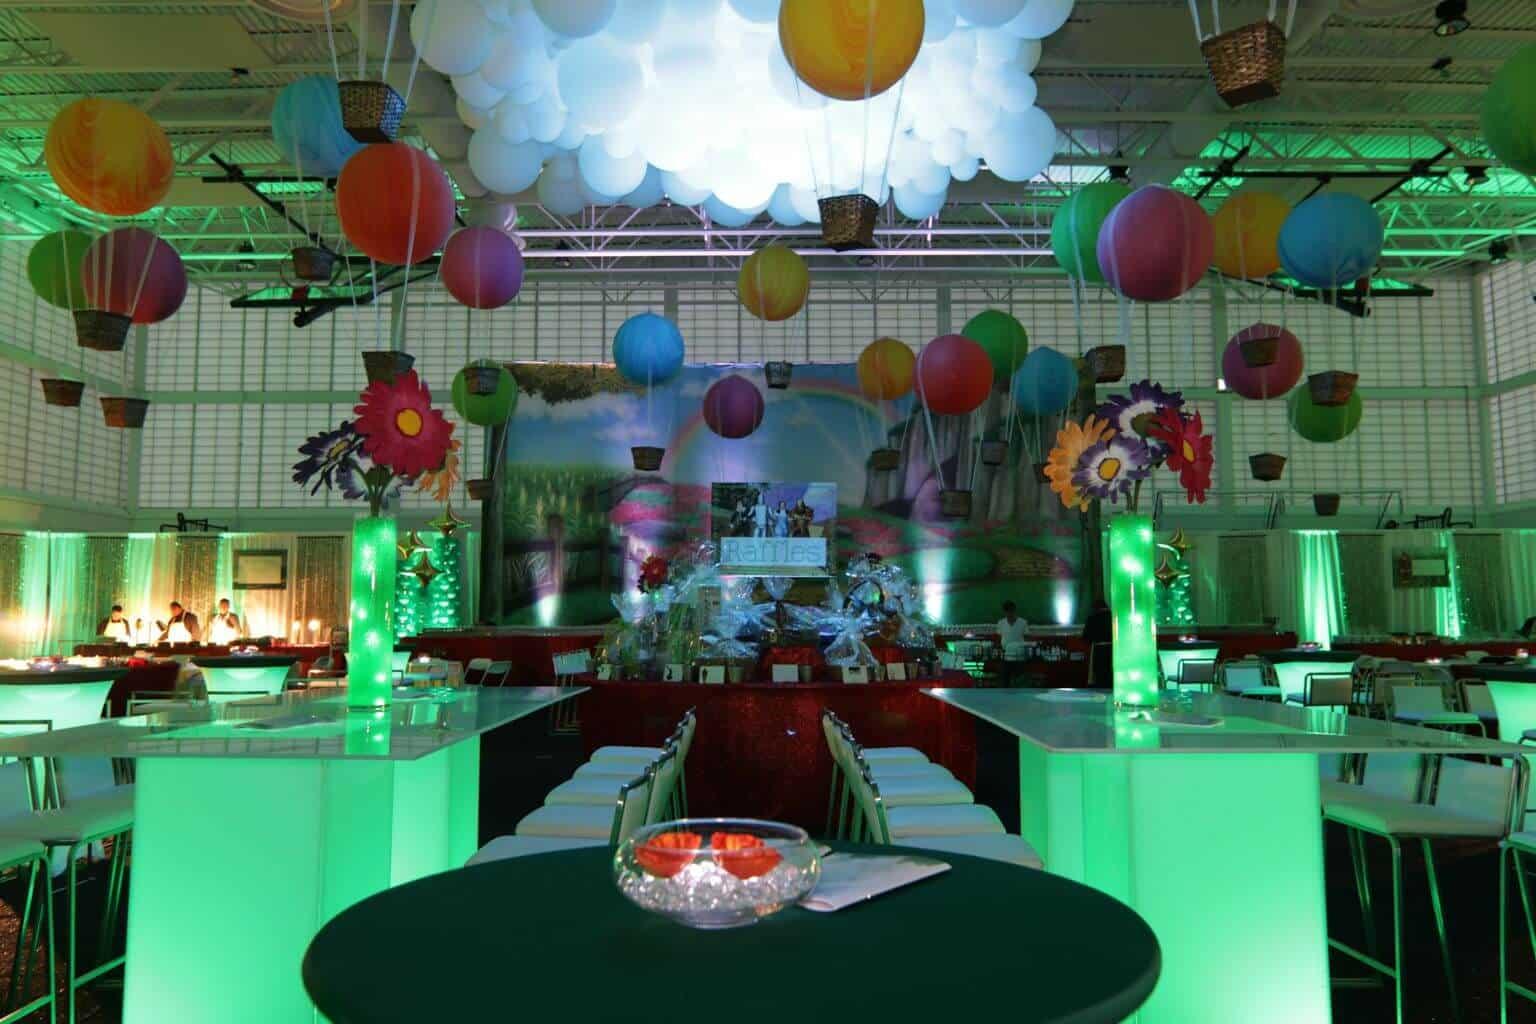 Party decor gallery · balloon artistry